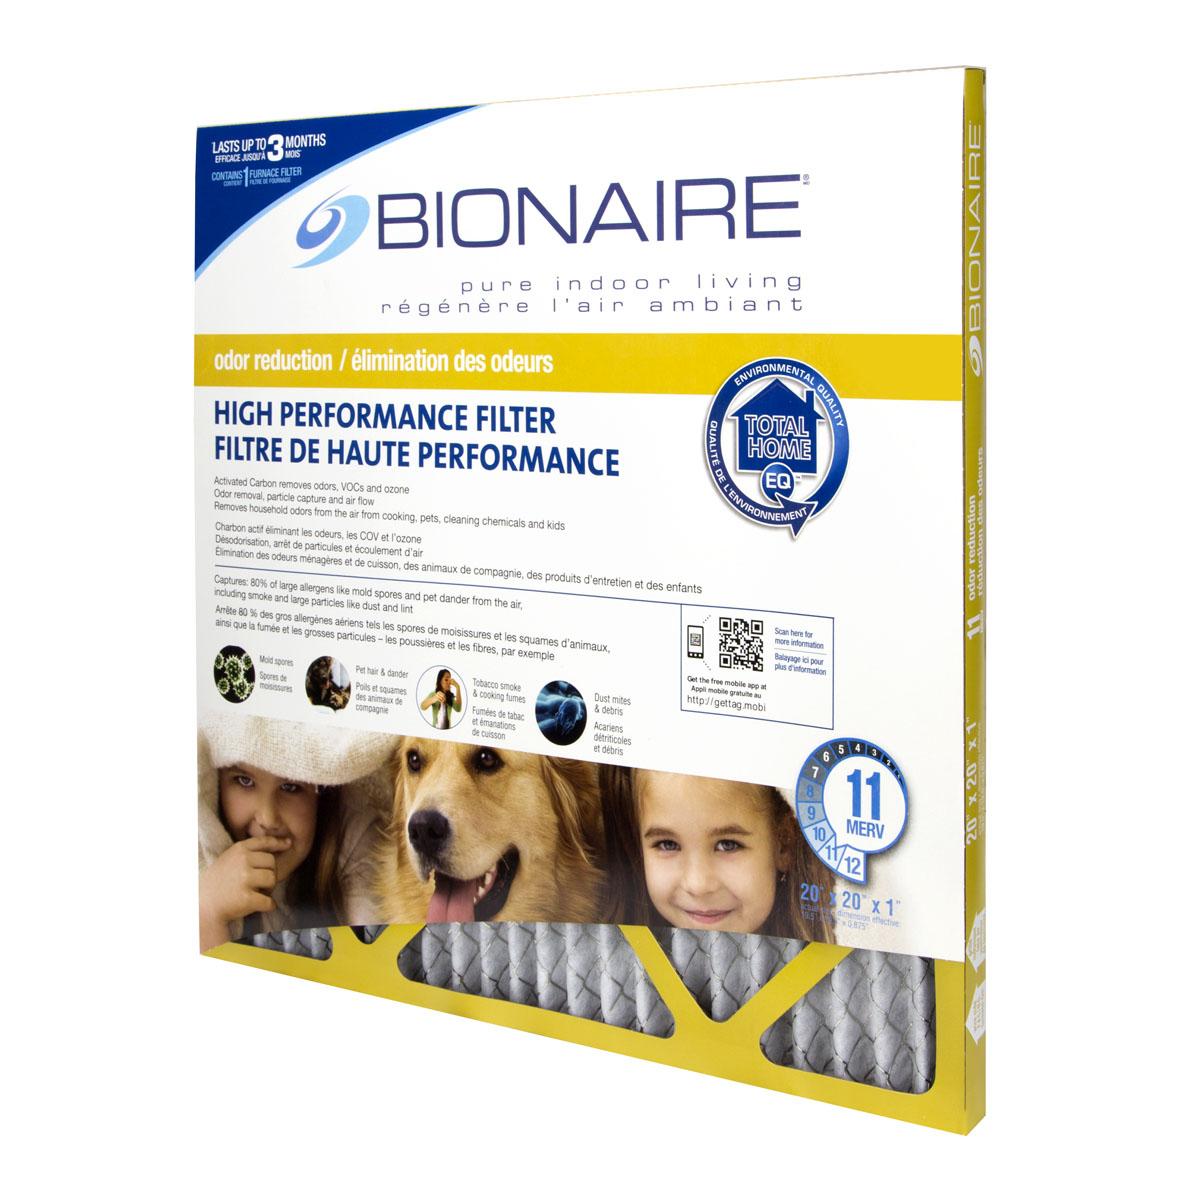 Bionaire® Odour Reduction MERV 11 Furnace Filter - 20x20